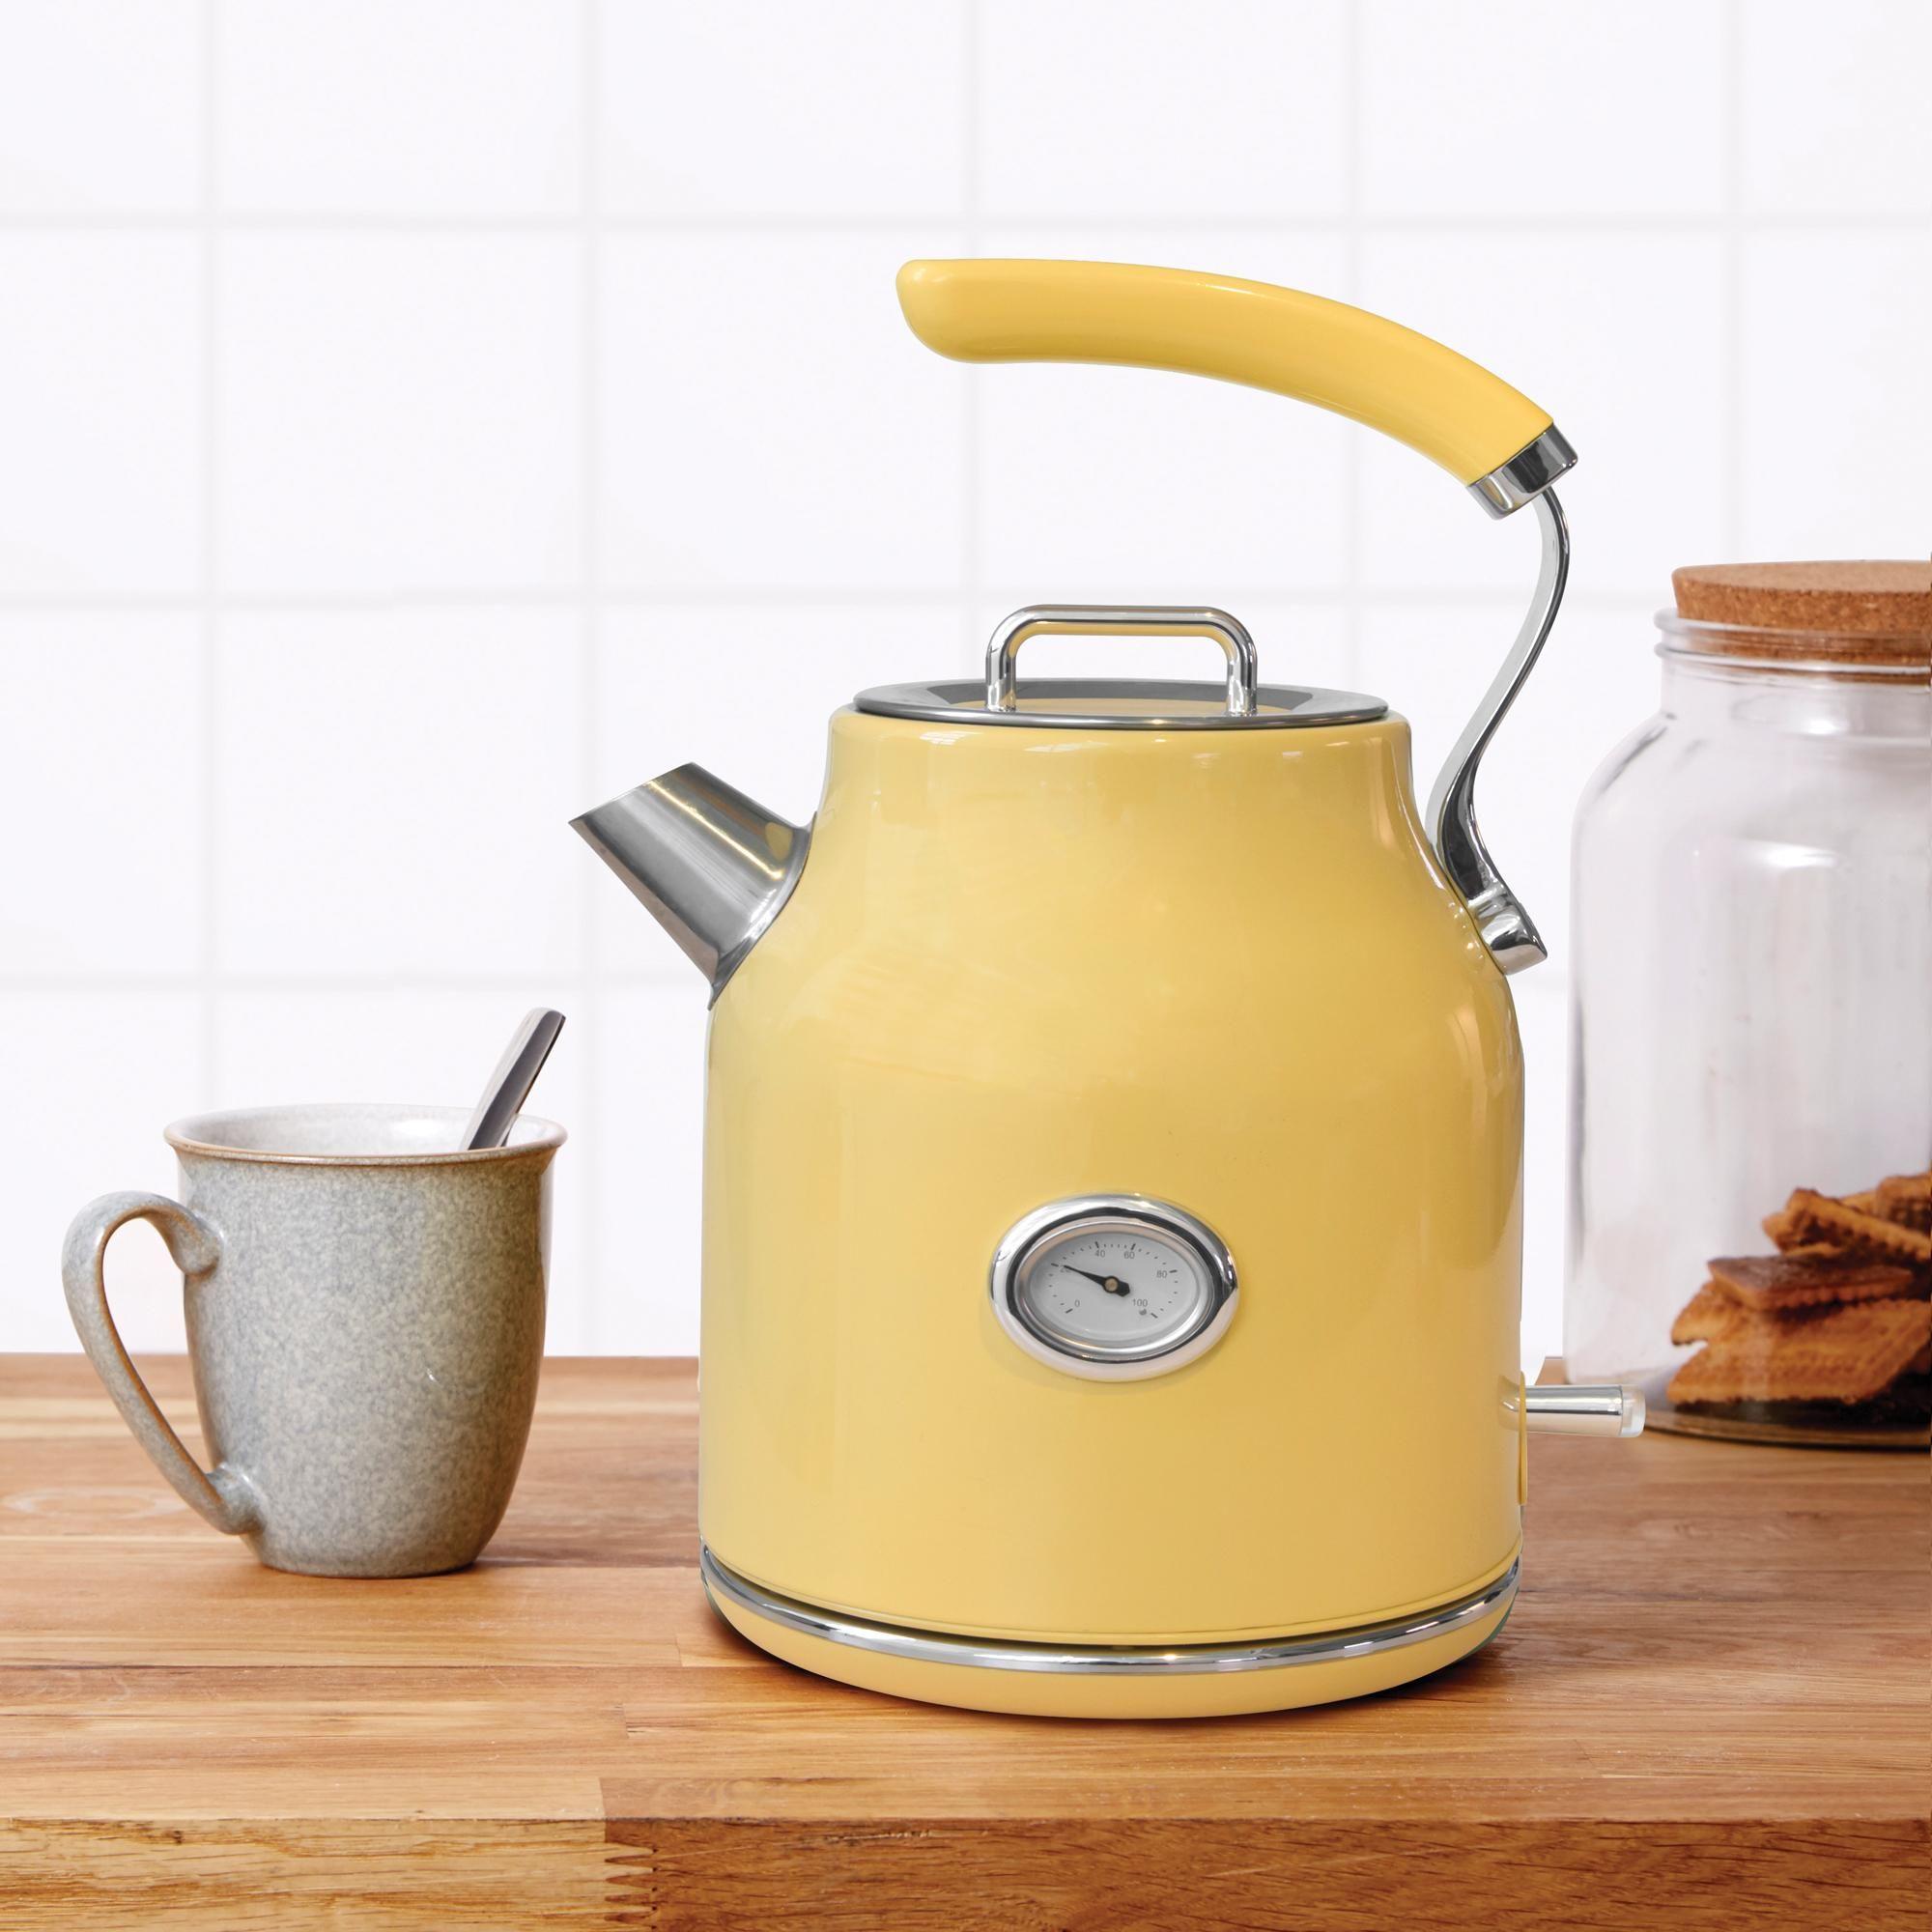 Dunelm Yellow 7.7L 7kW Jug kettle  Retro kitchen appliances